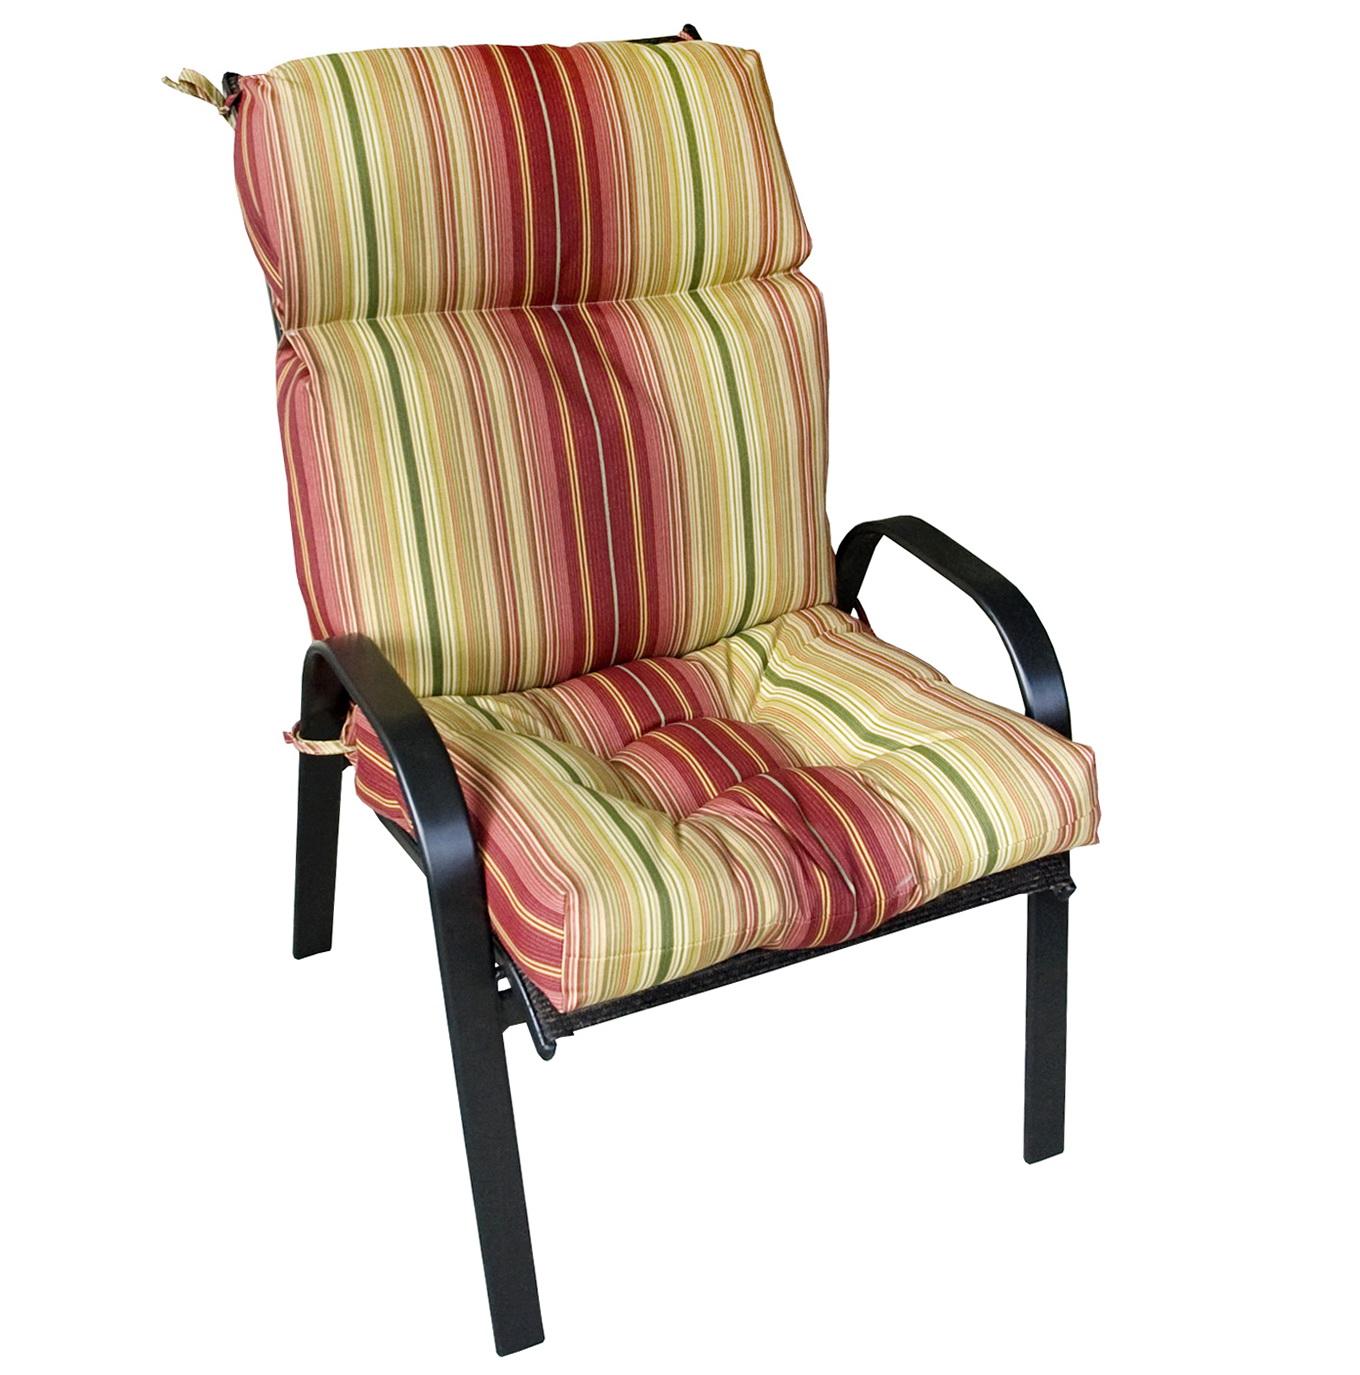 Patio Furniture Seat Cushions Sale  Home Design Ideas